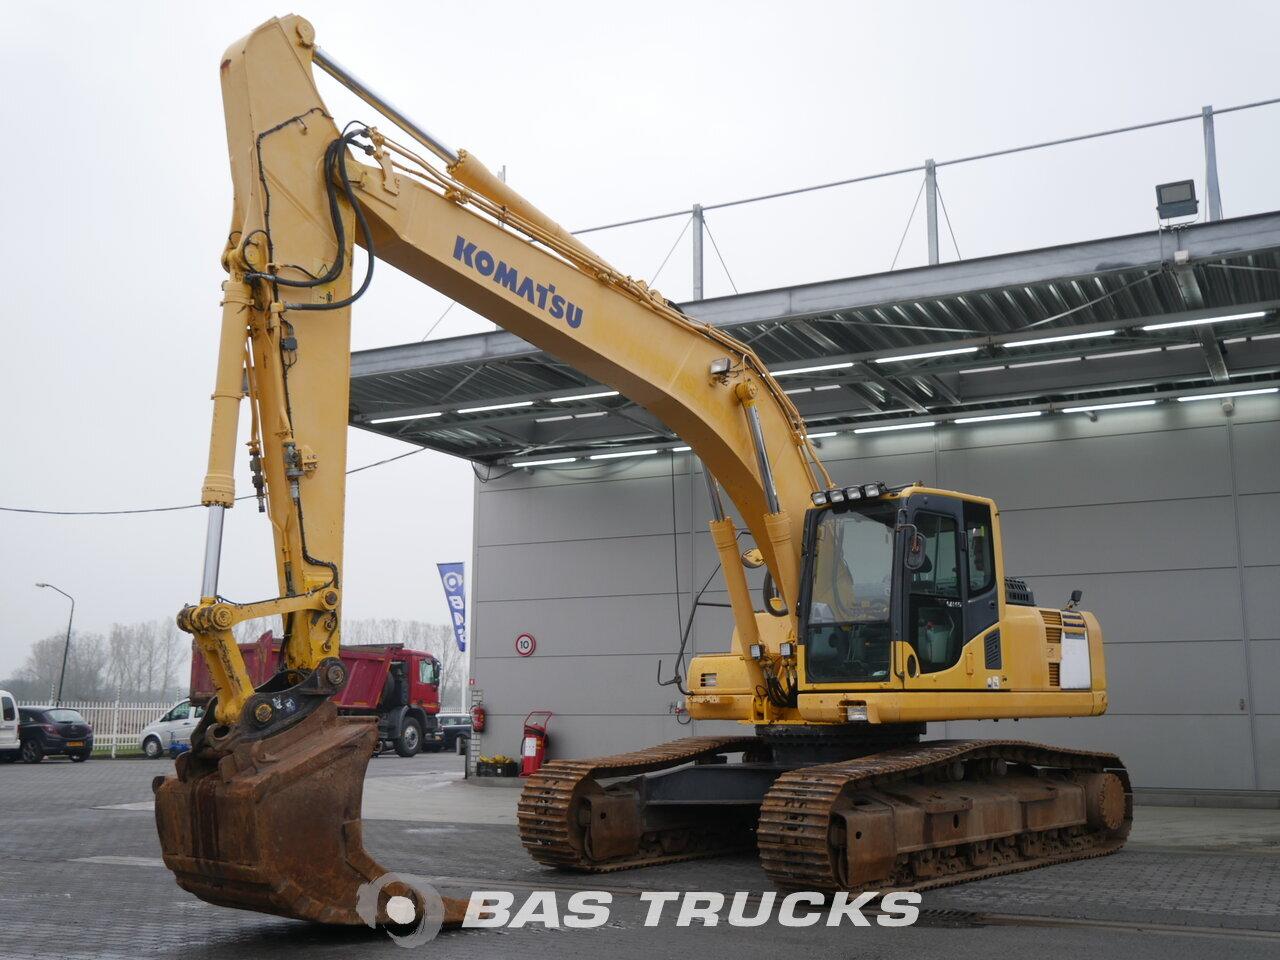 komatsu pc290 8 construction equipment u20ac46500 bas machinery rh basmachinery com 290 Excavator Komatsu Pc290lc-11